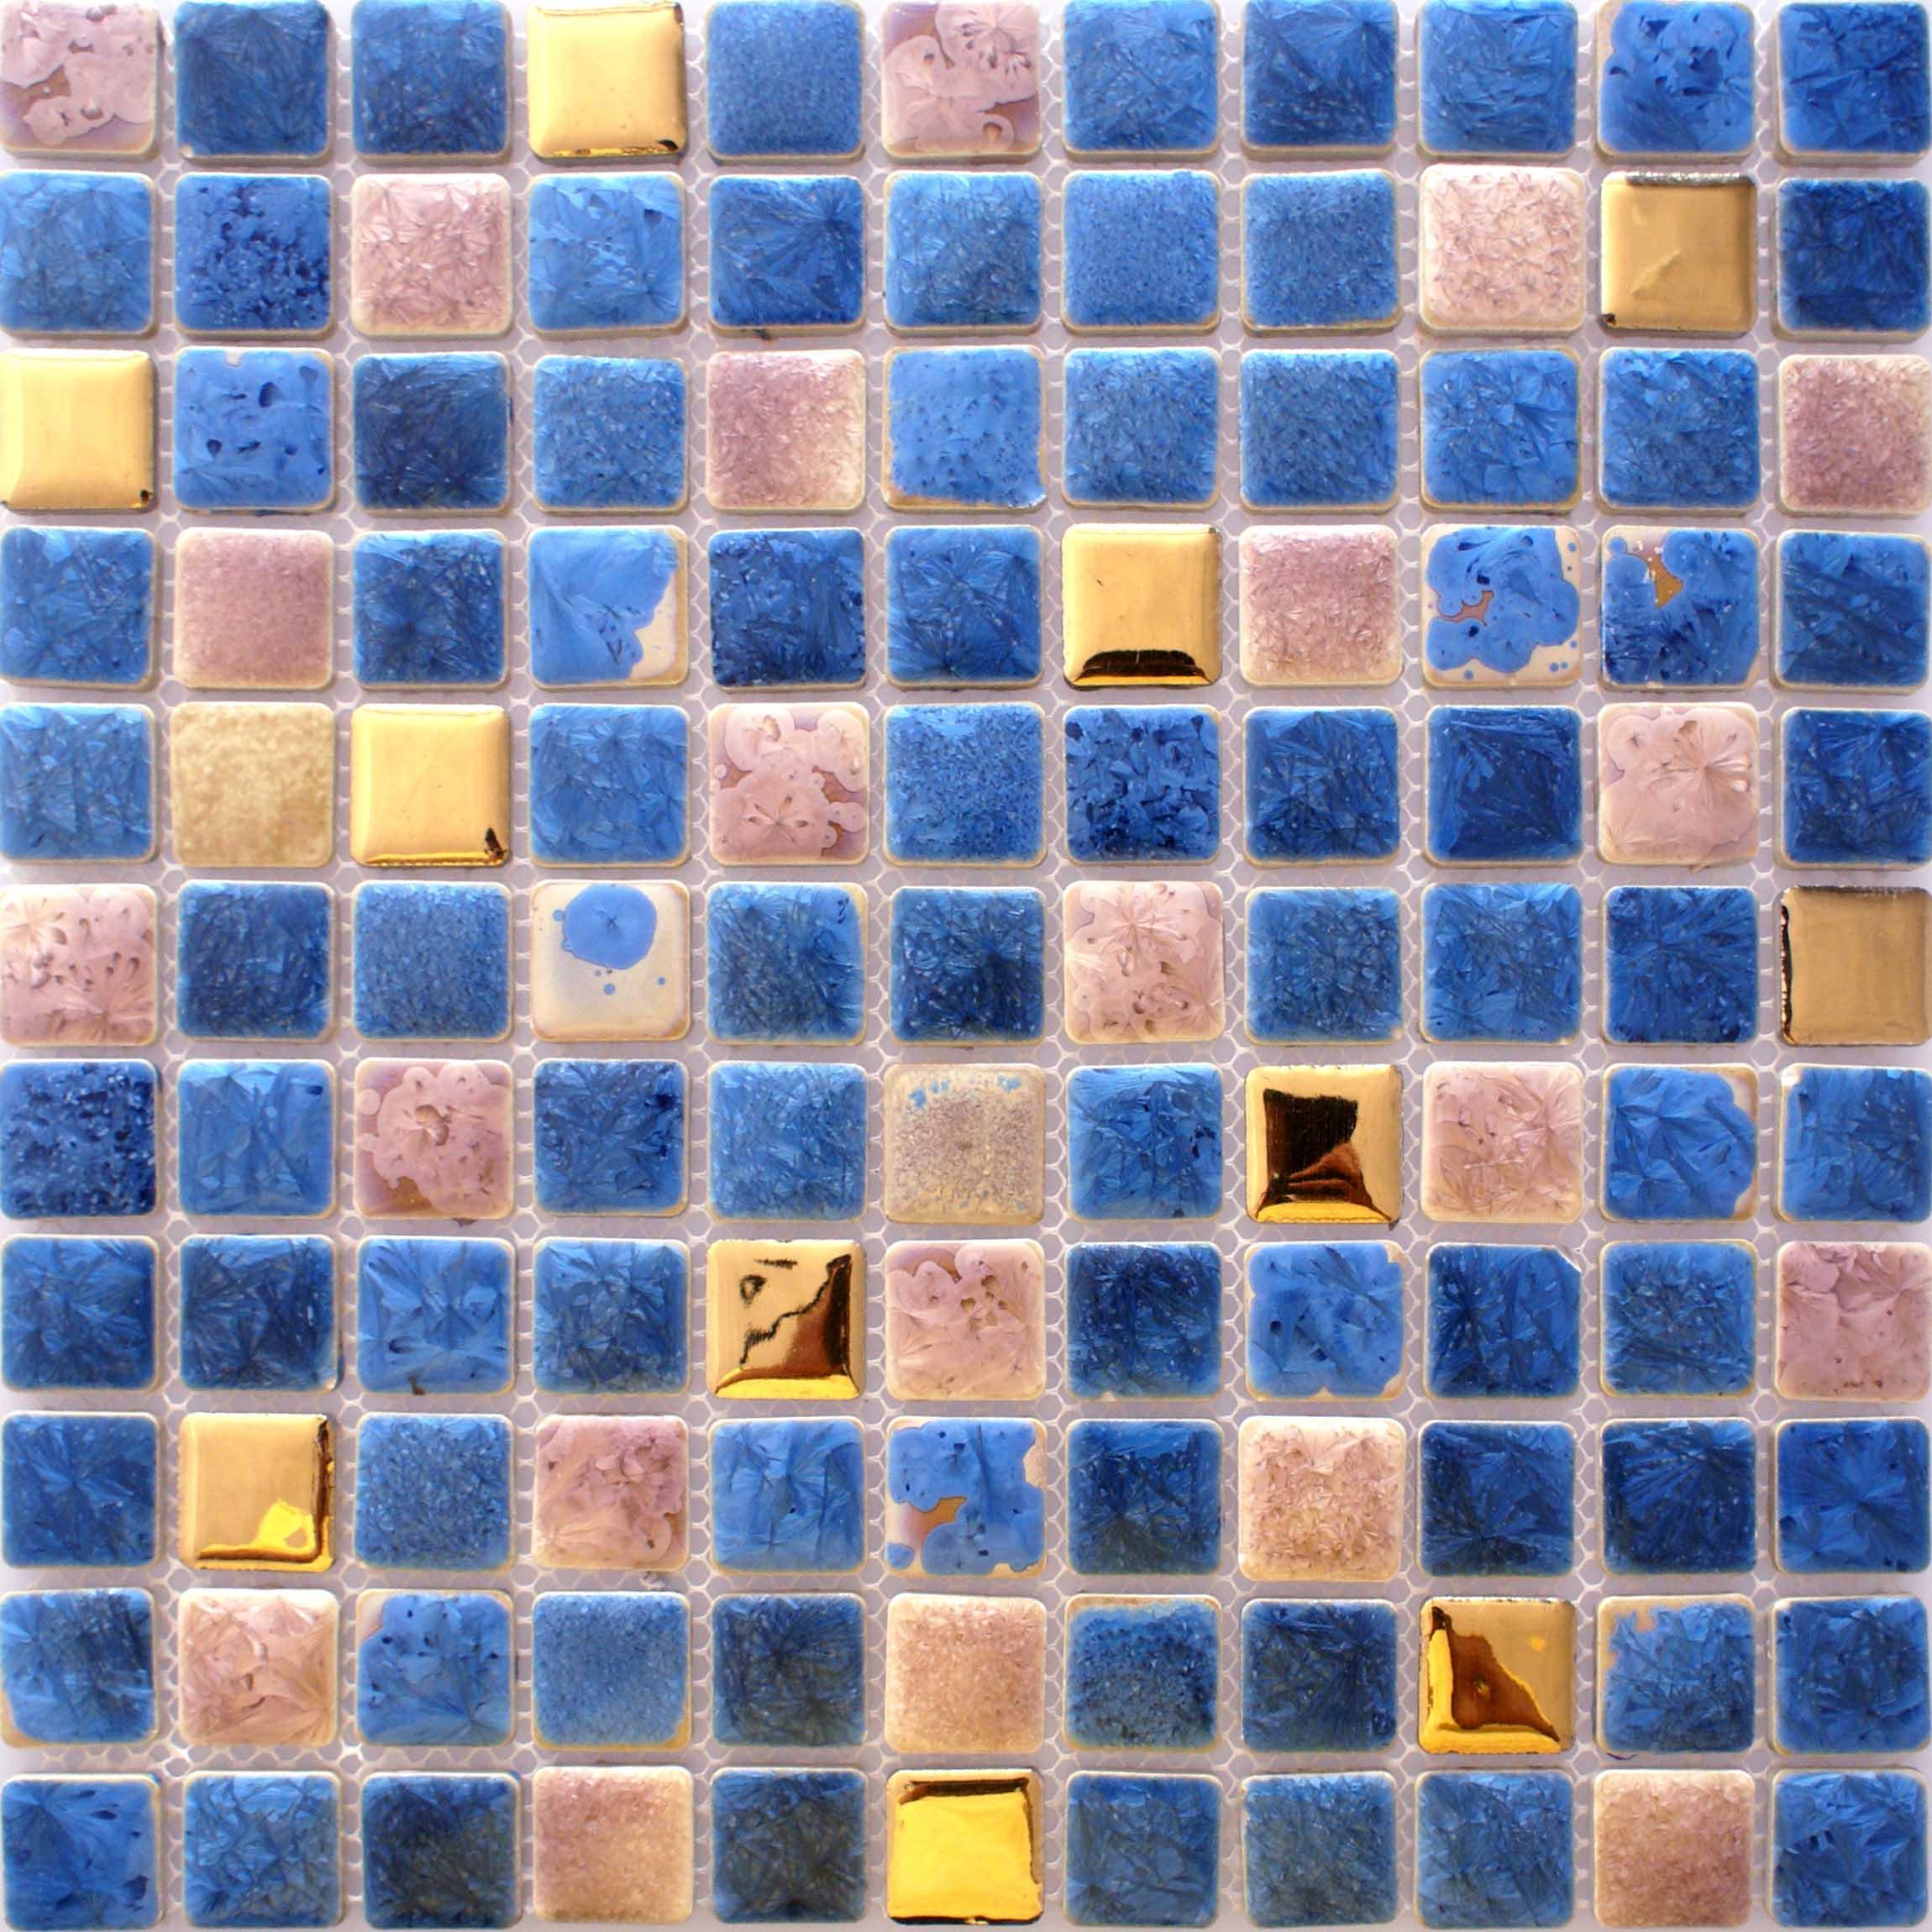 Blue Tiles For Kitchen Porcelain Tile Snowflake Style Mosaic Art Design